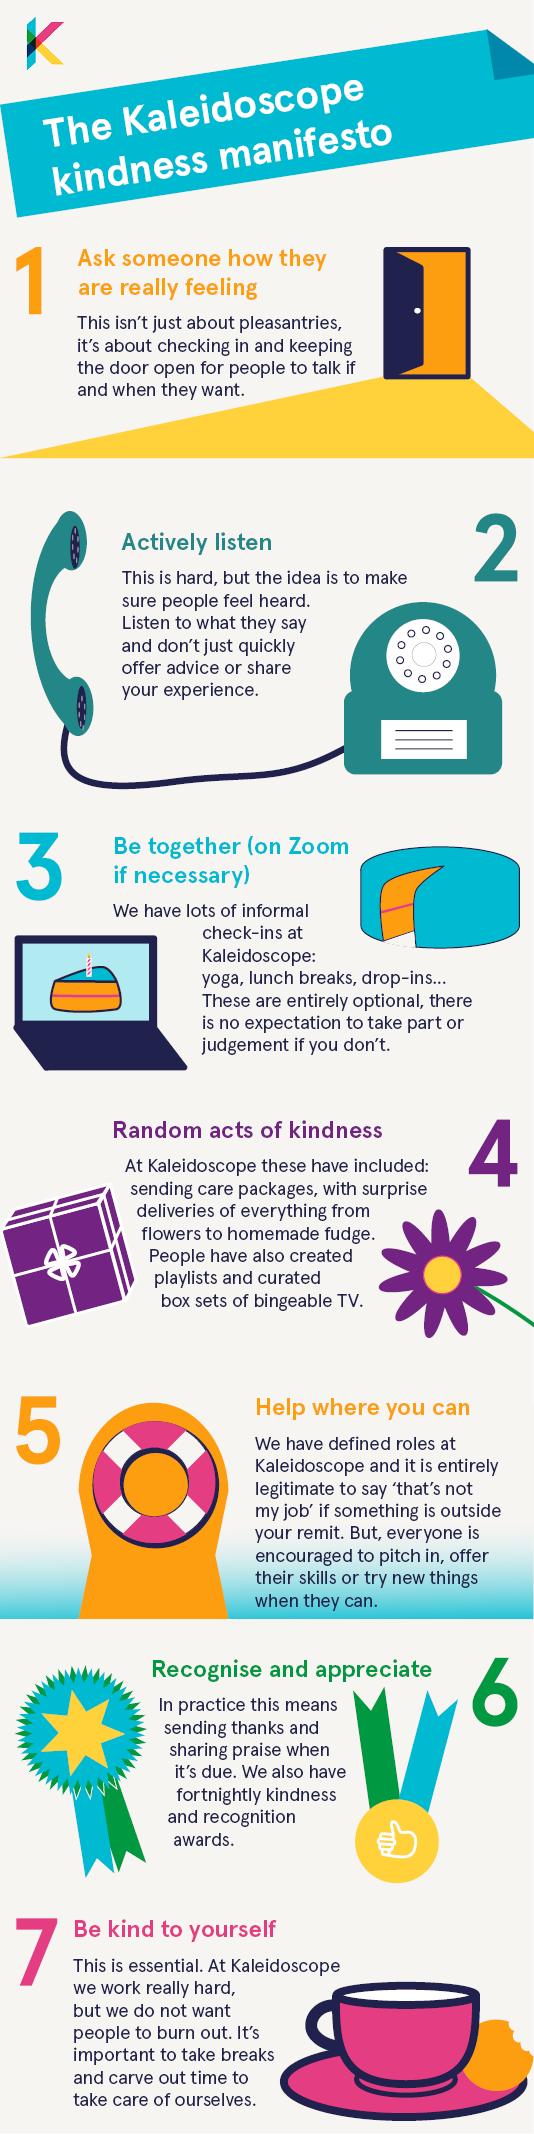 Kaleidoscope kindness manifesto